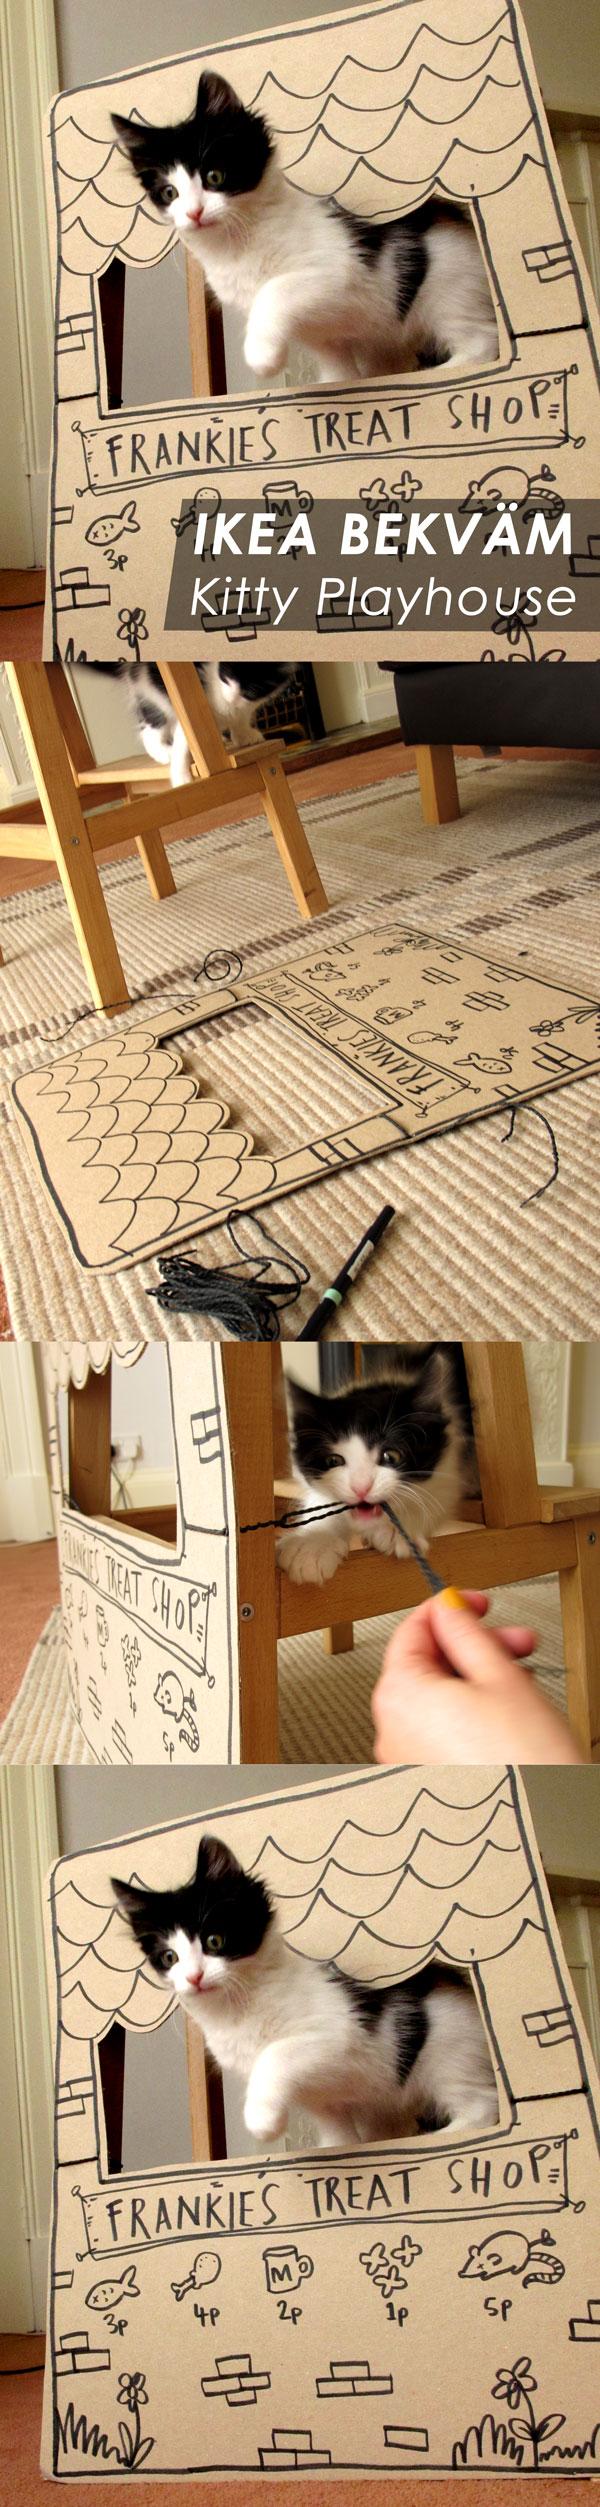 IKEA Bekvam Kitty Playhouse DIY by Nikki McWilliams